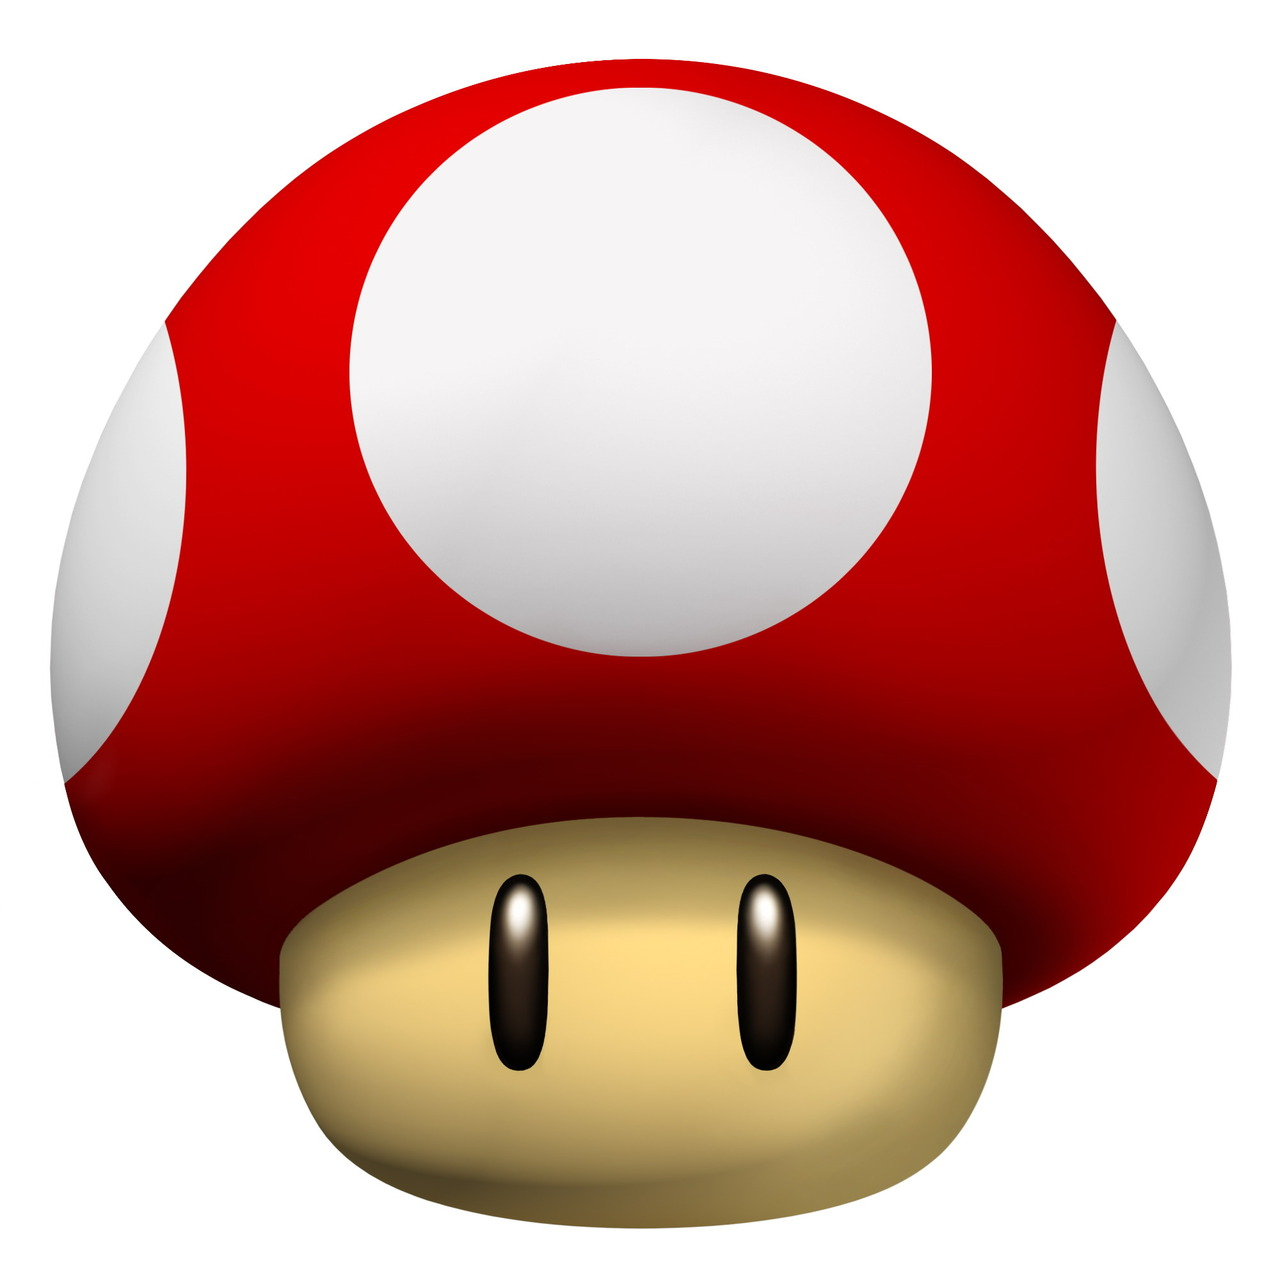 jeuxvideo.com New Super Mario Bros. - Nintendo DS Image 53 sur 93